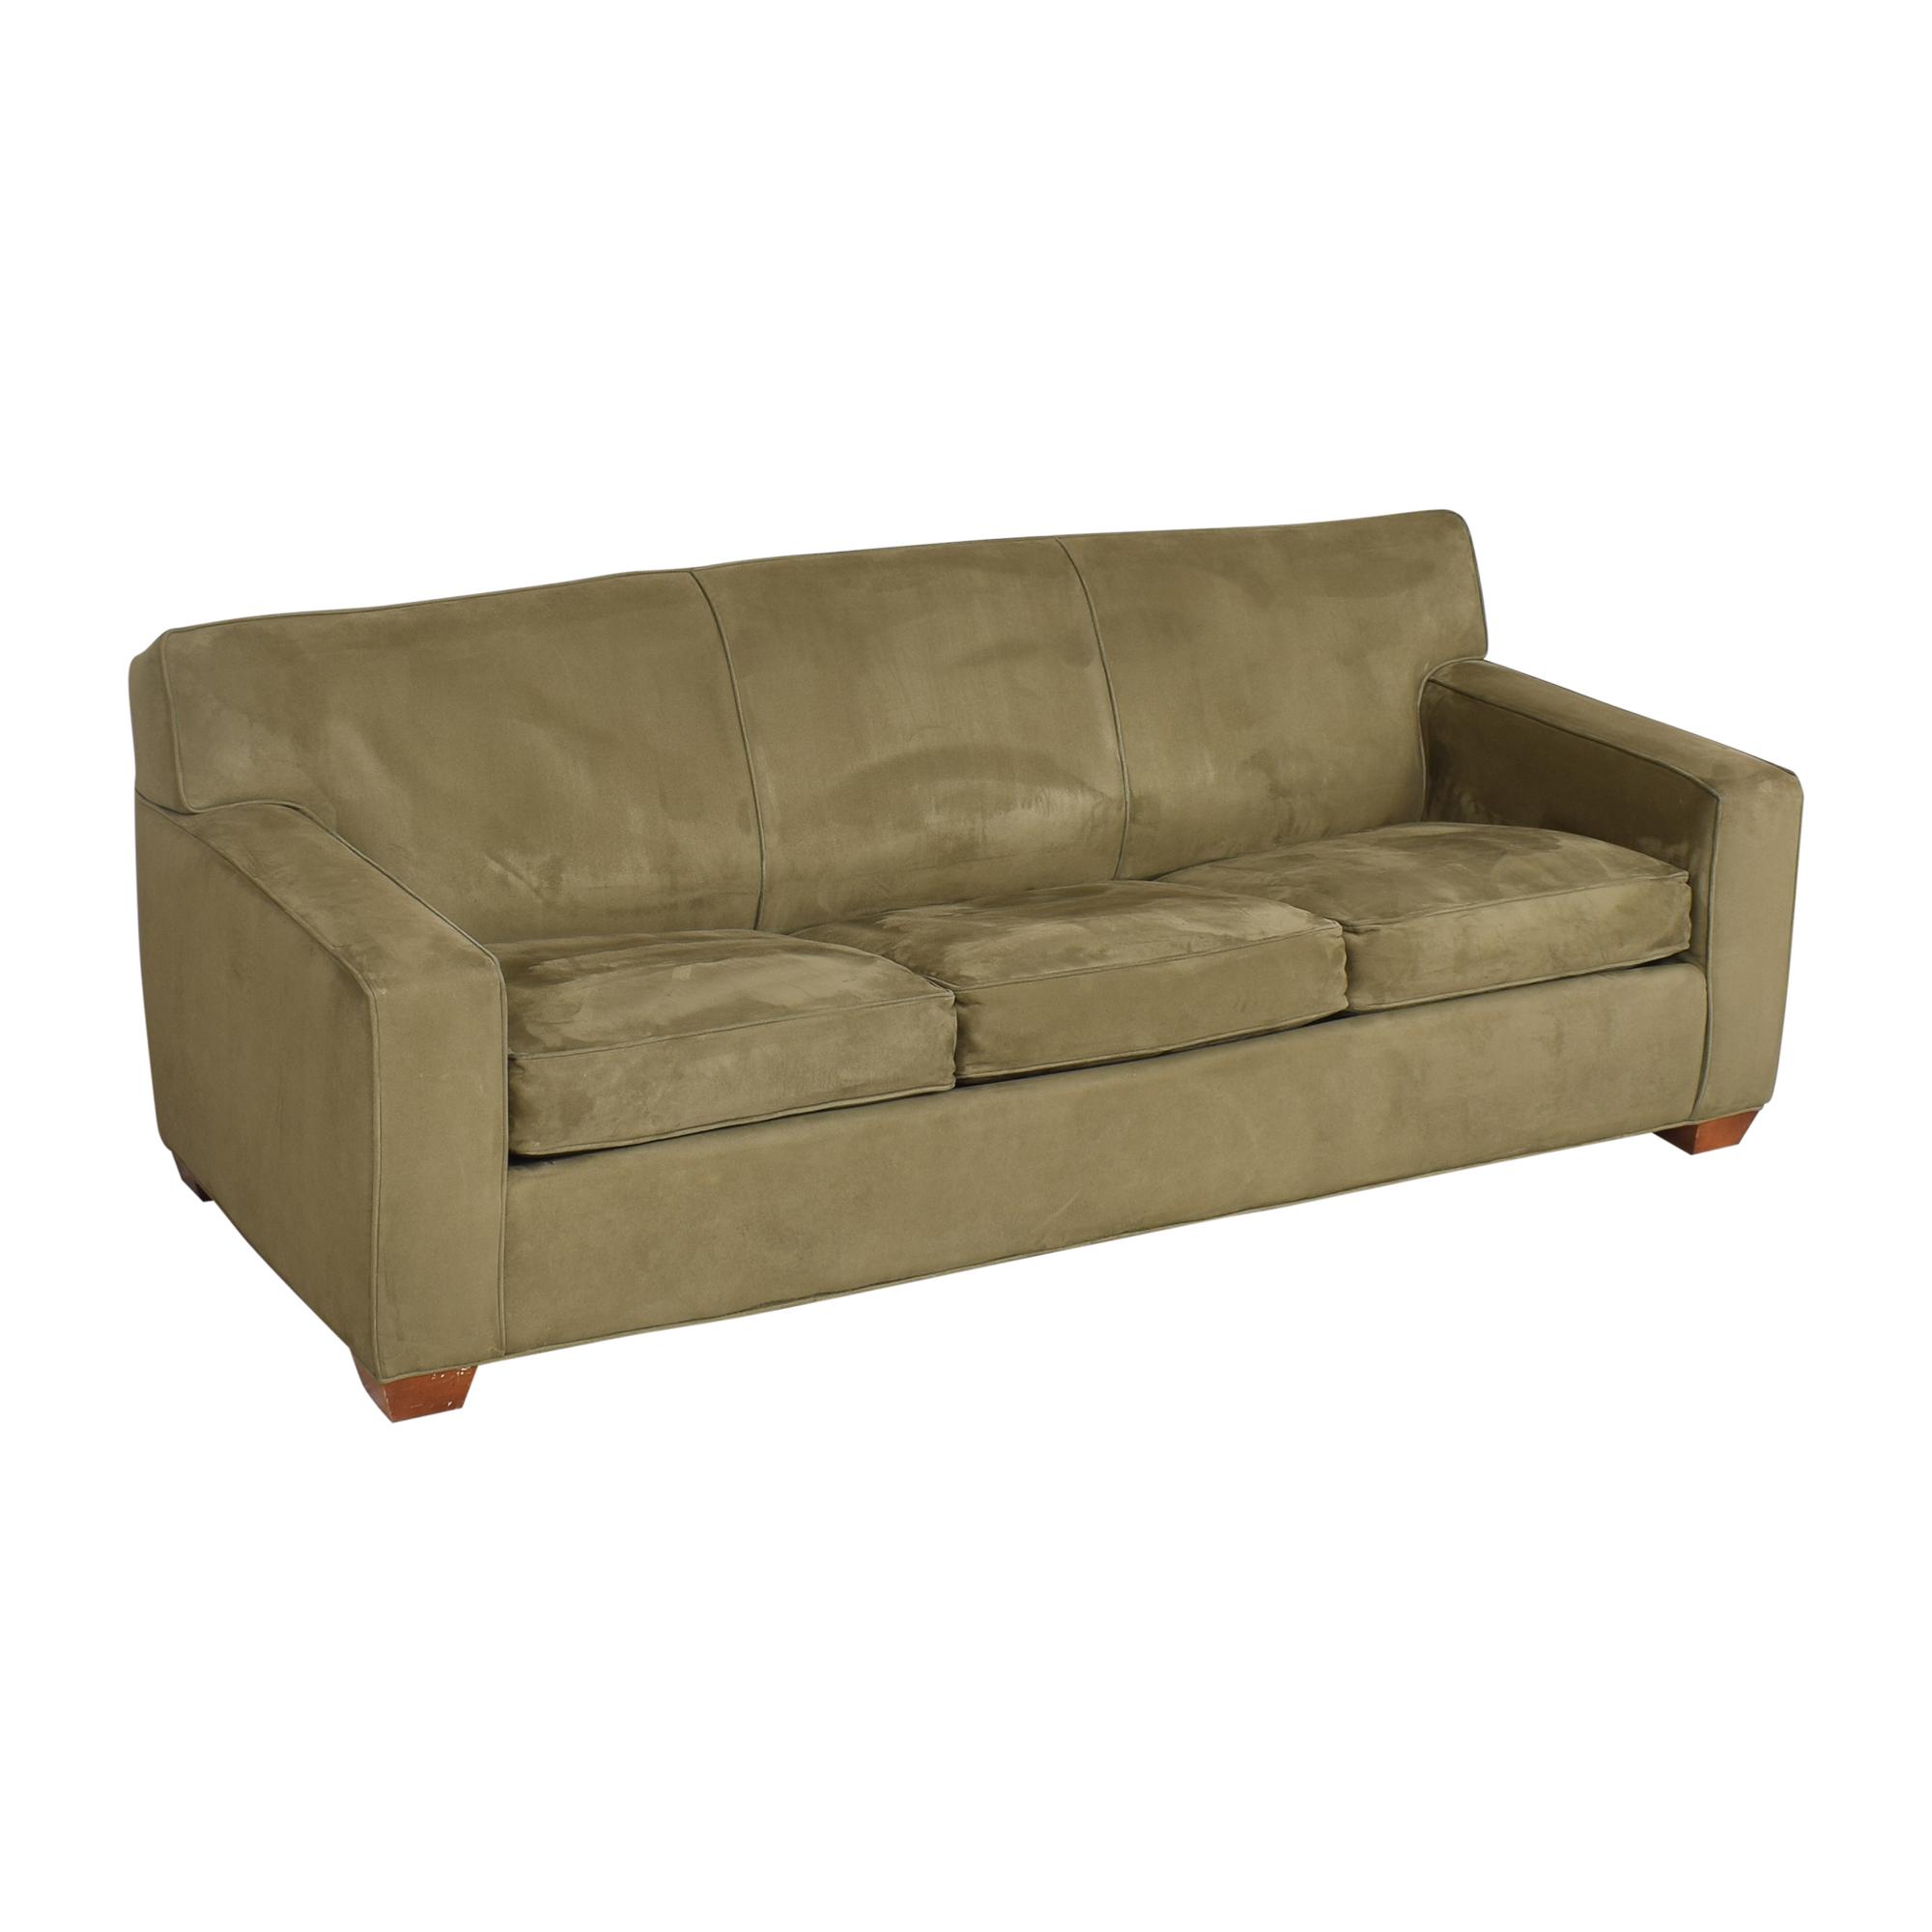 buy Crate & Barrel Crate & Barrel Three Cushion Sleeper Sofa  online